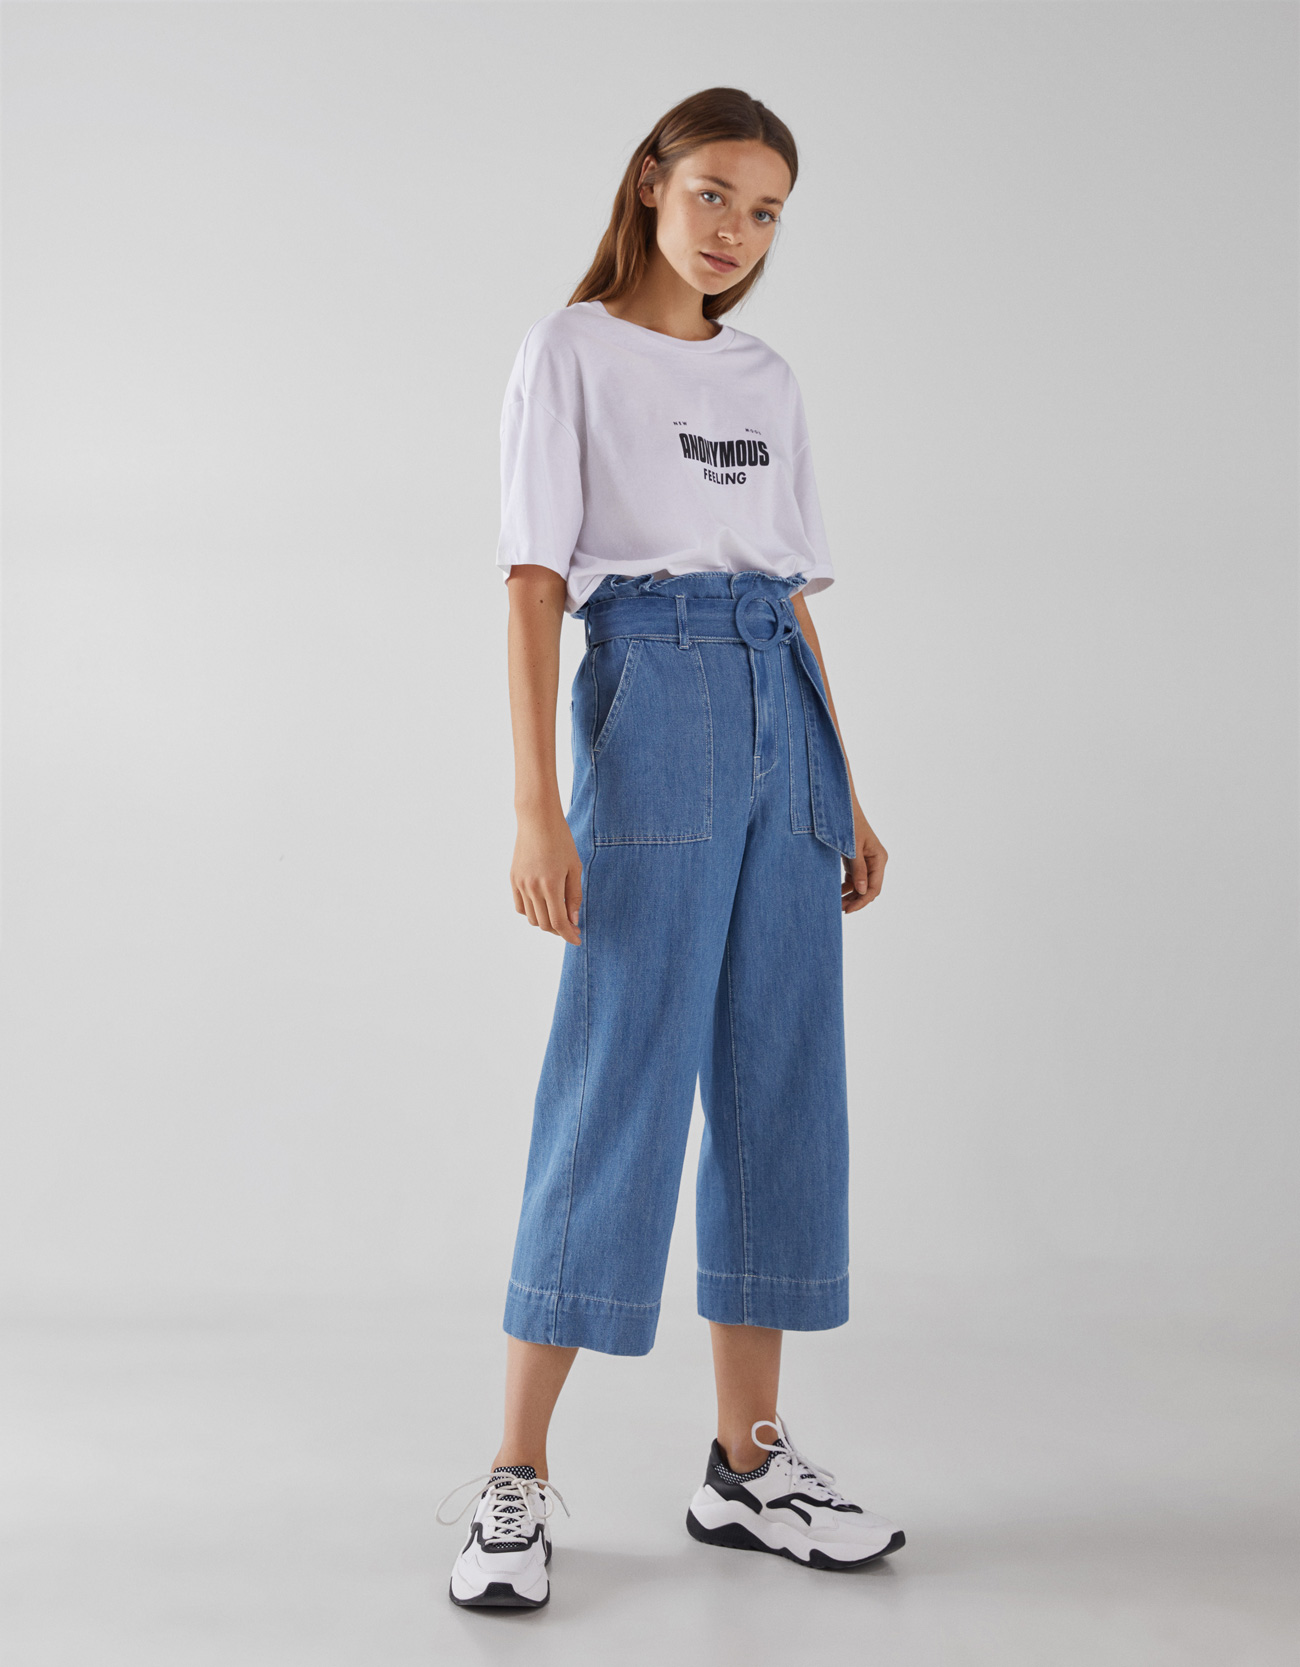 e2329de3e09 High-rise paperbag jeans - CLOTHING - Bershka Israel